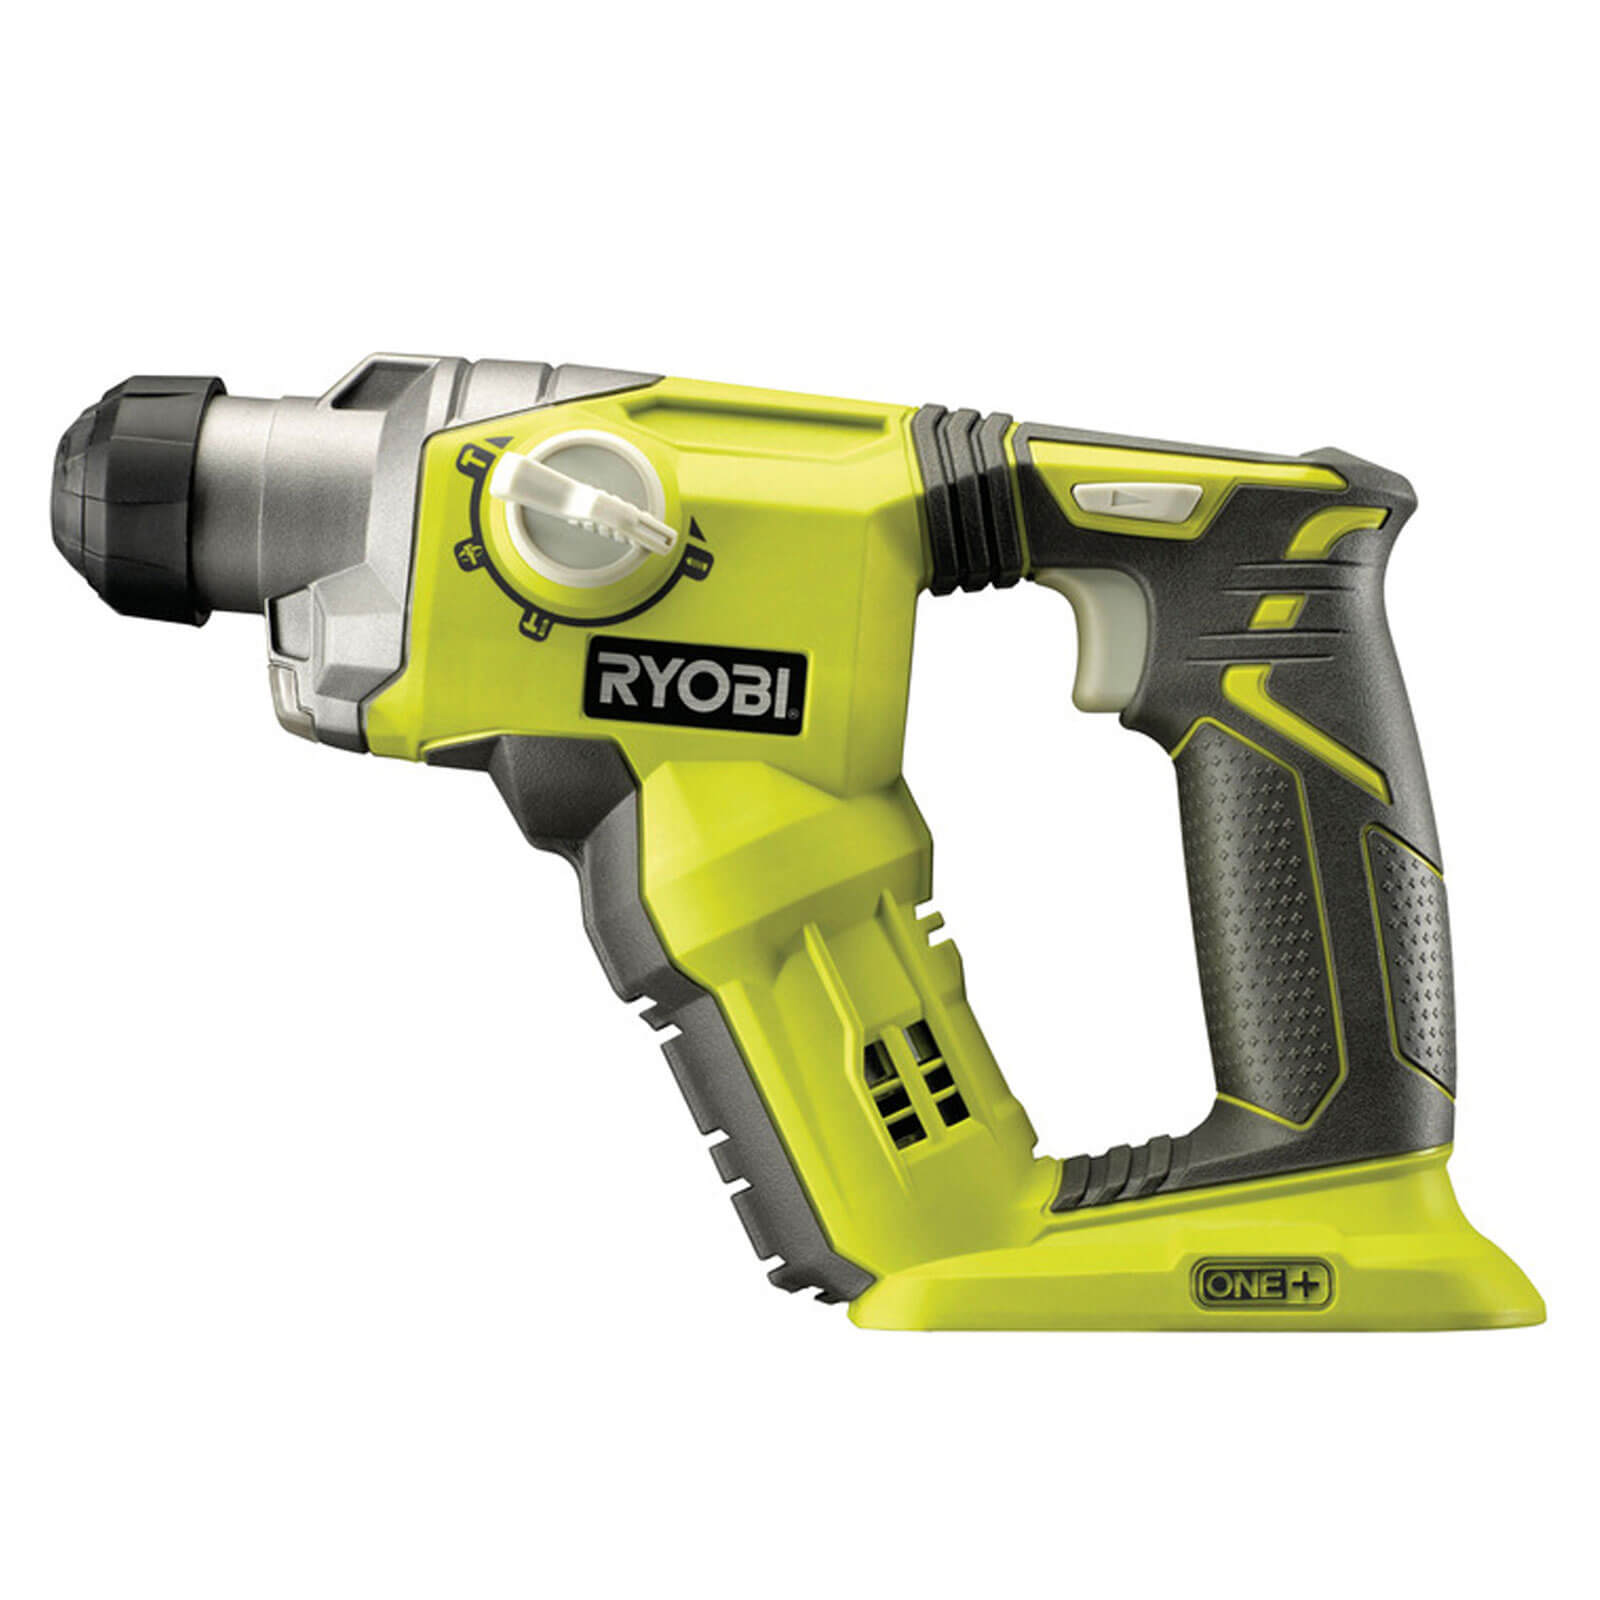 Ryobi R18SDS 18v Cordless SDS Plus Hammer Drill No Batteries No Charger No Case